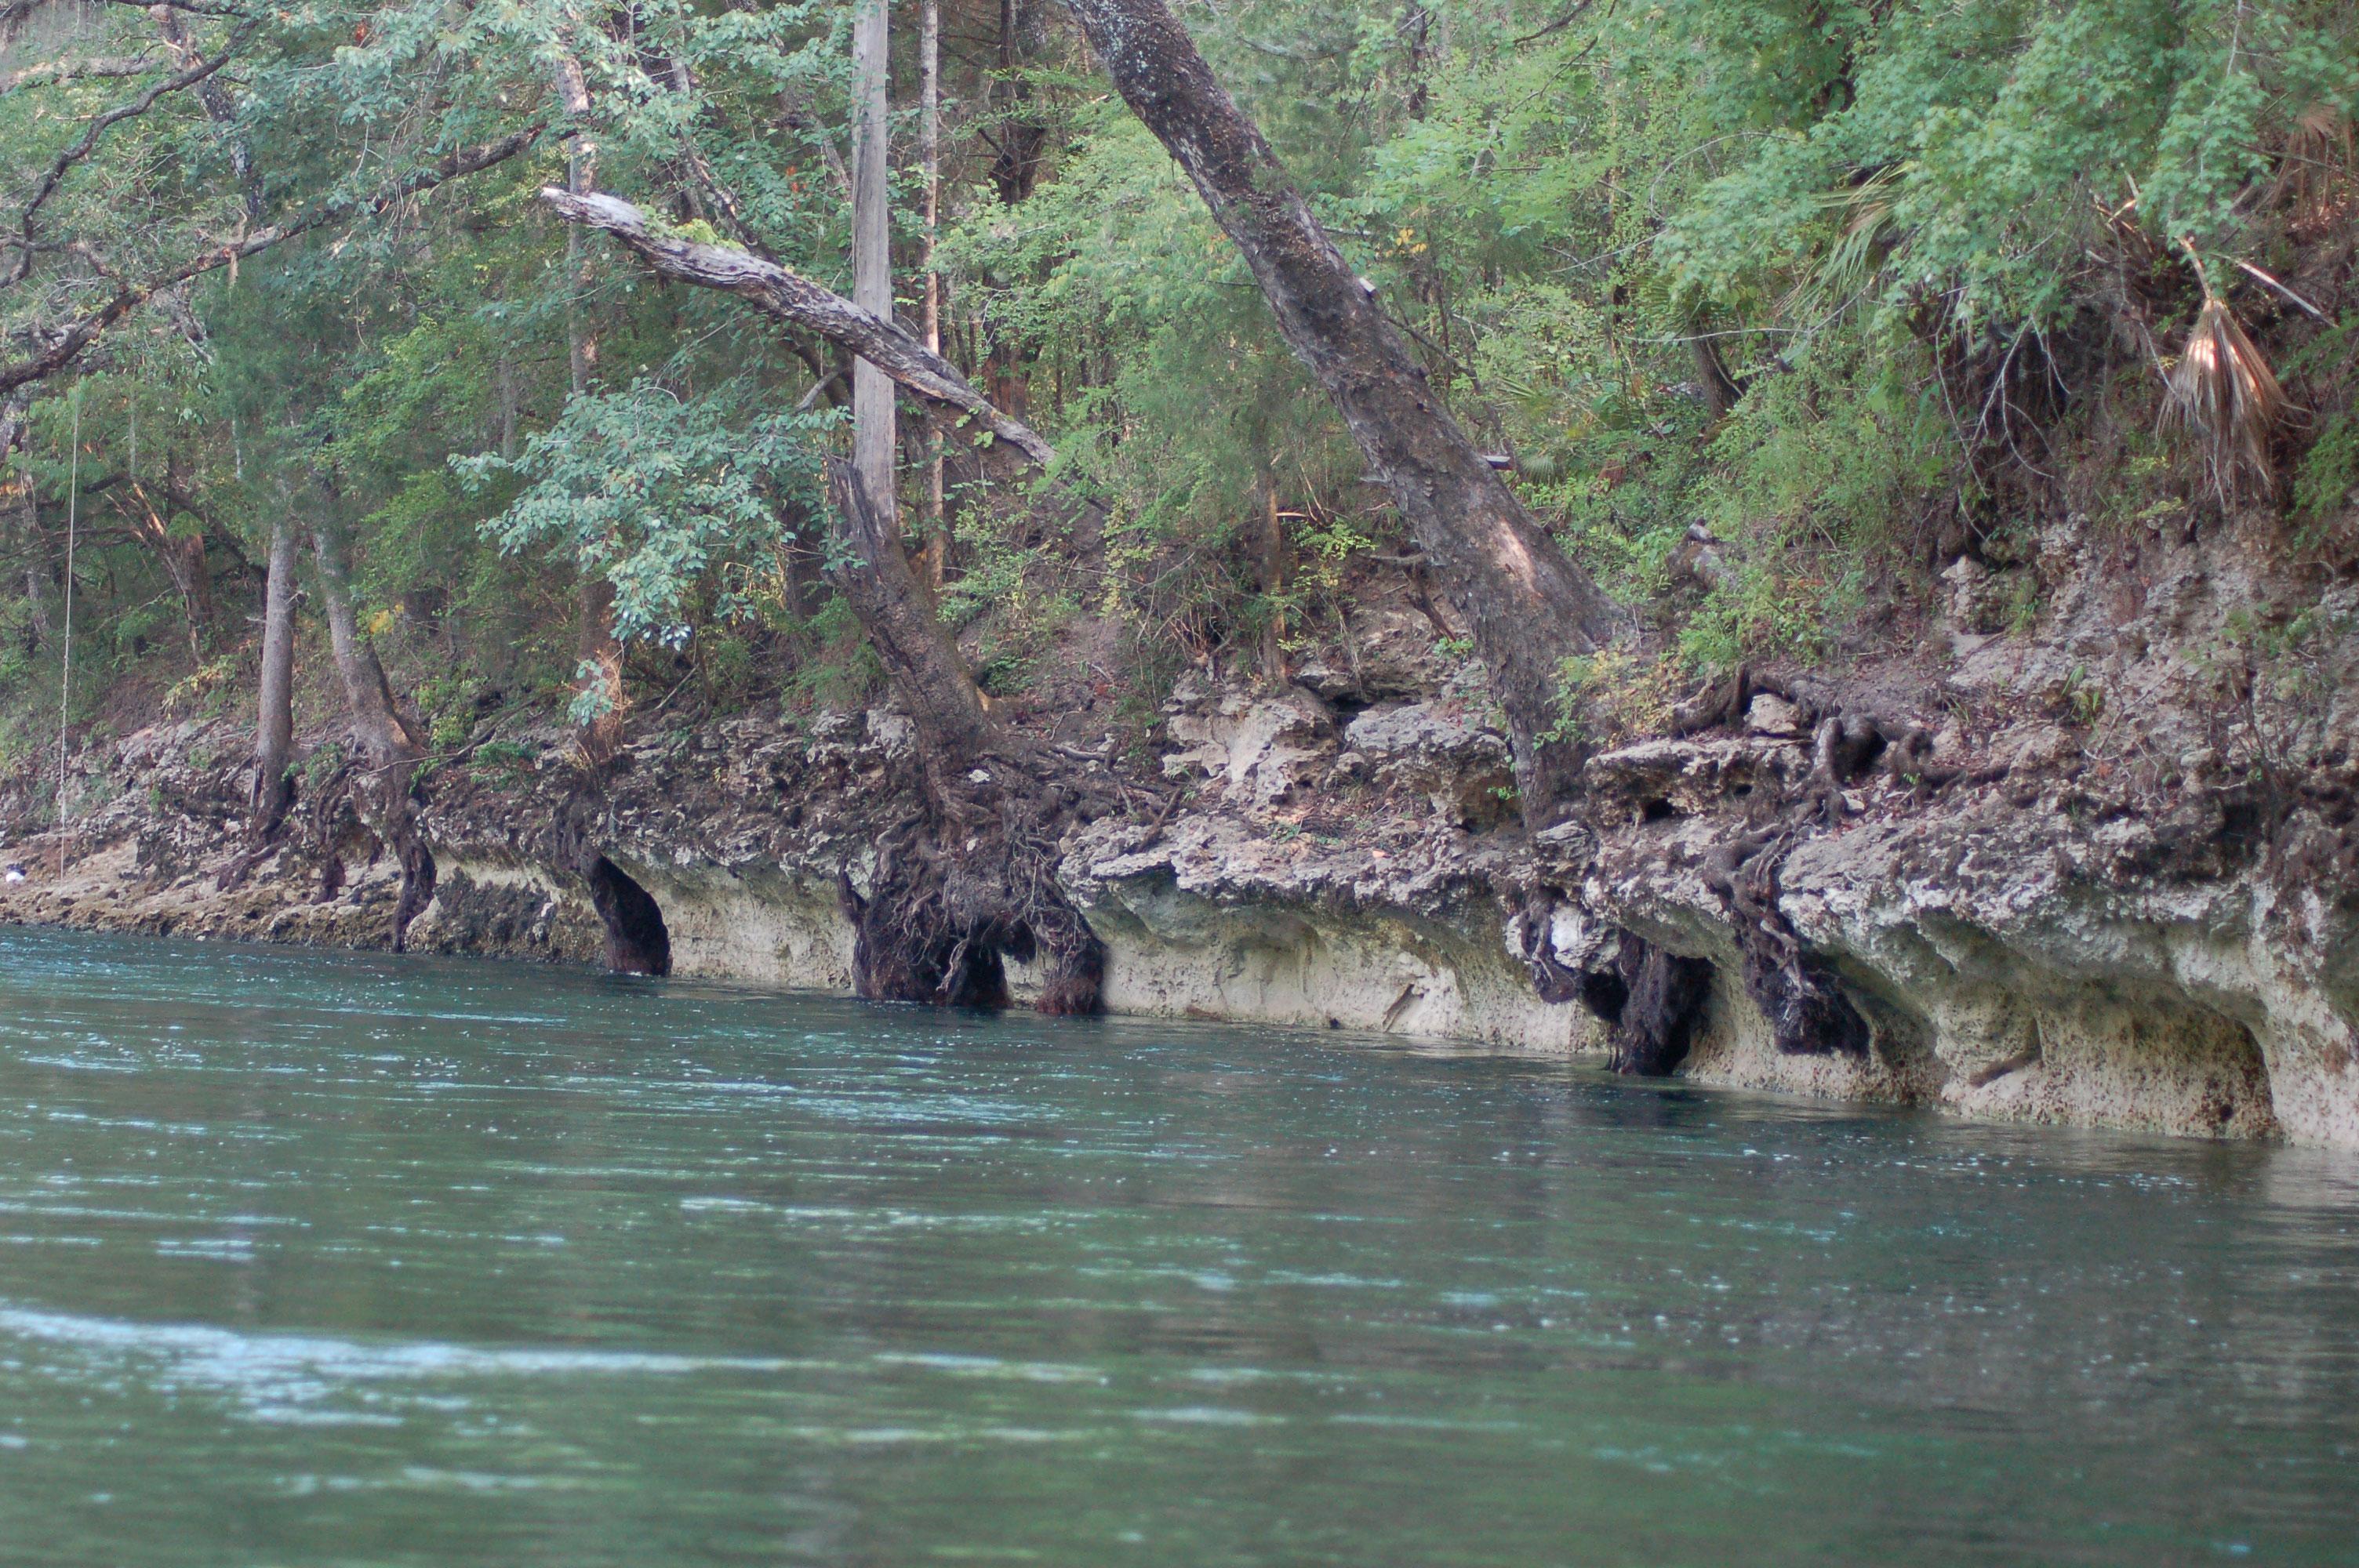 limestone-karsts-stock-photos-florida-panhandle-chipola-river-linda-bateman